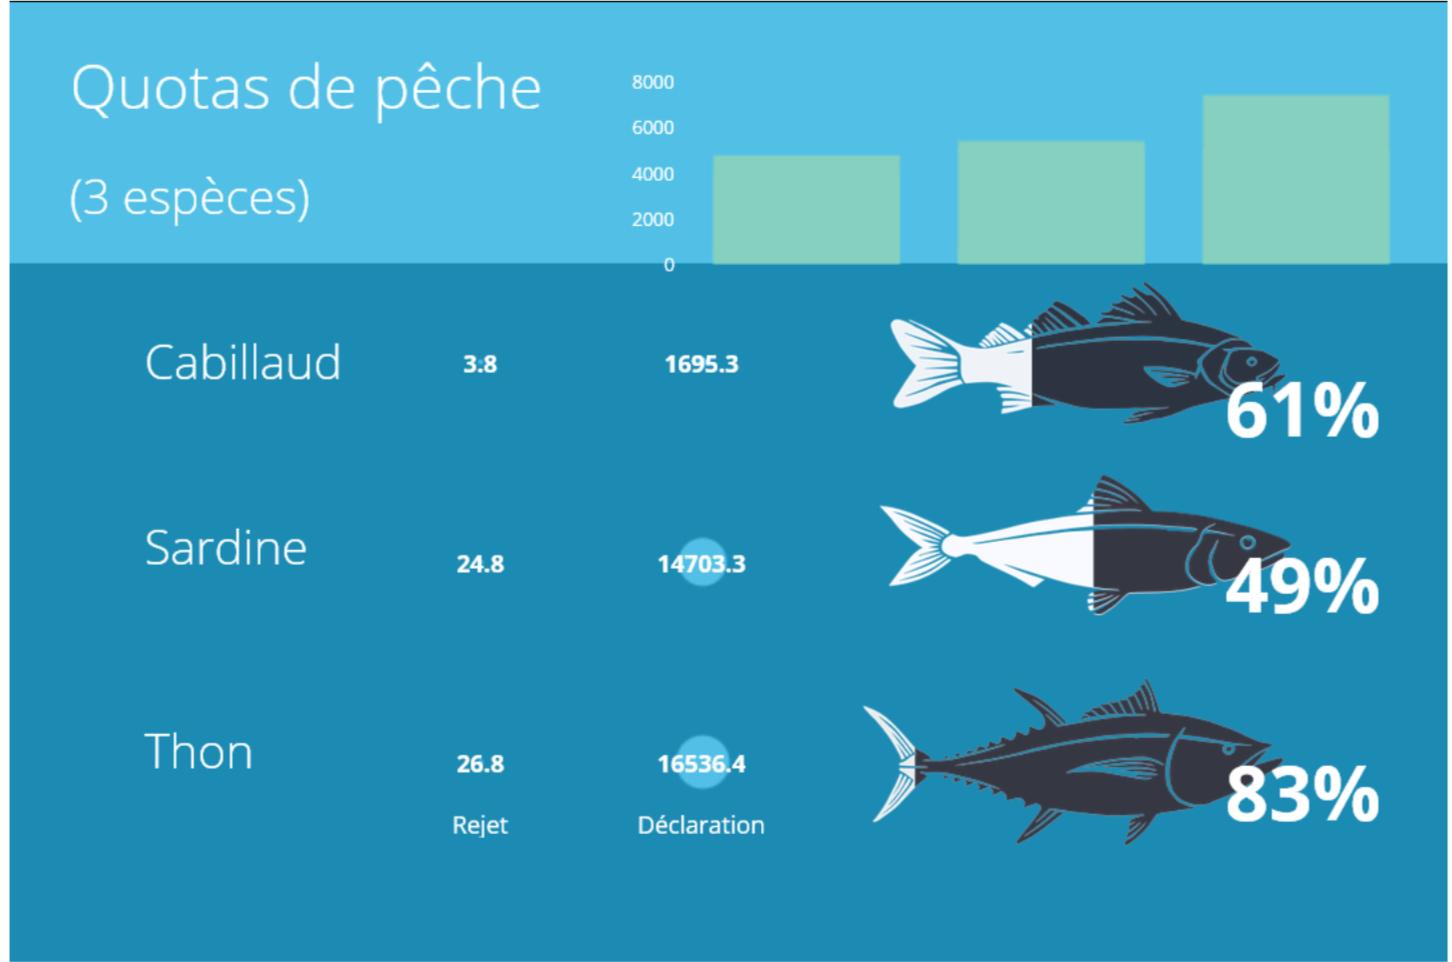 infographic-quotas-de-peche.png